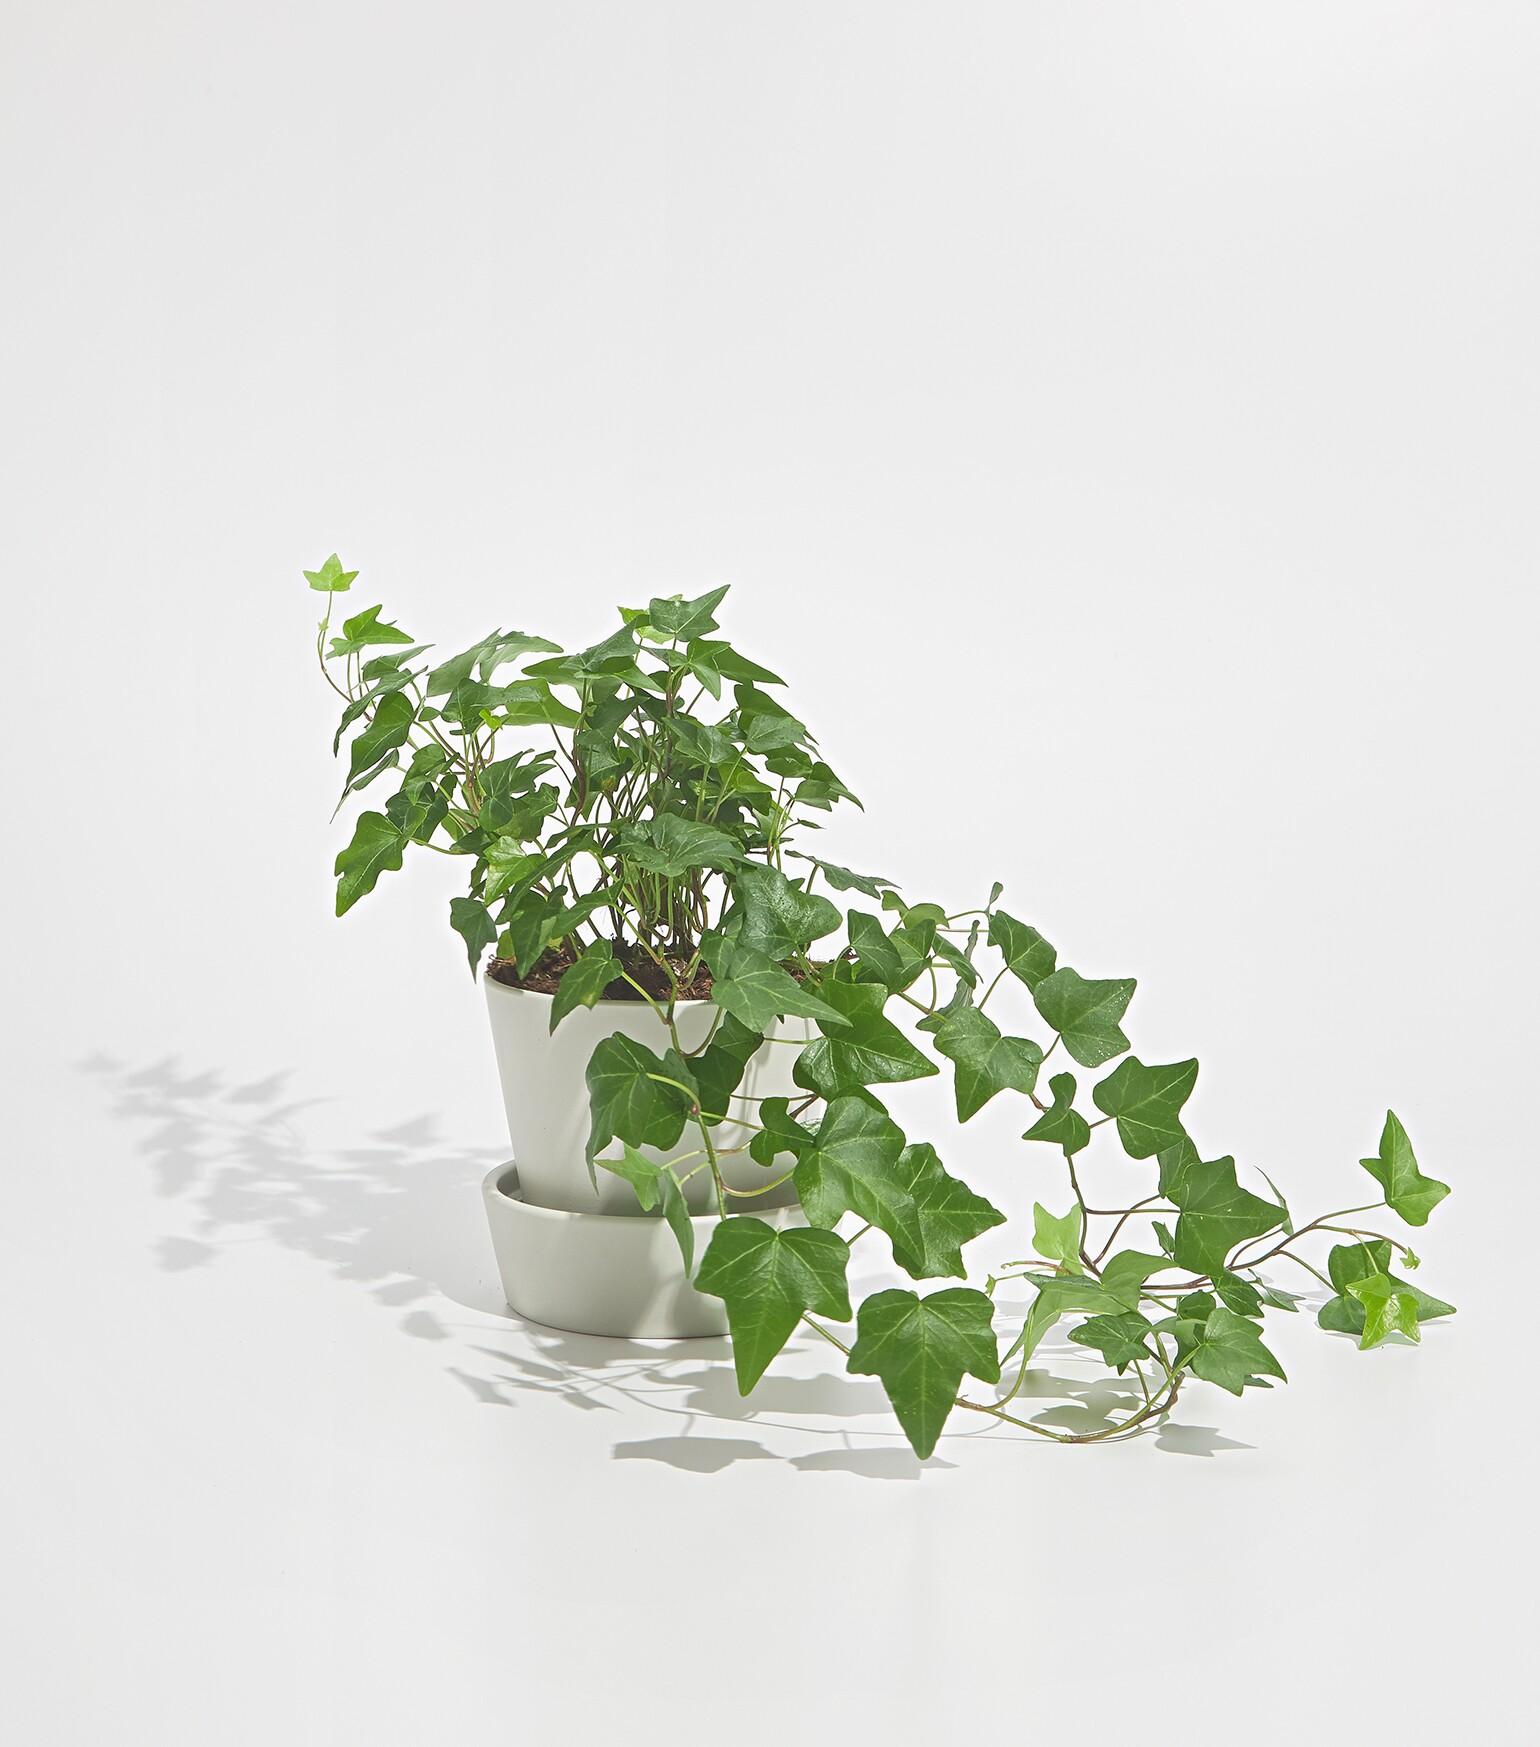 17122_AARP_Plants_&_Books_0396C_Eng_Ivy.jpg